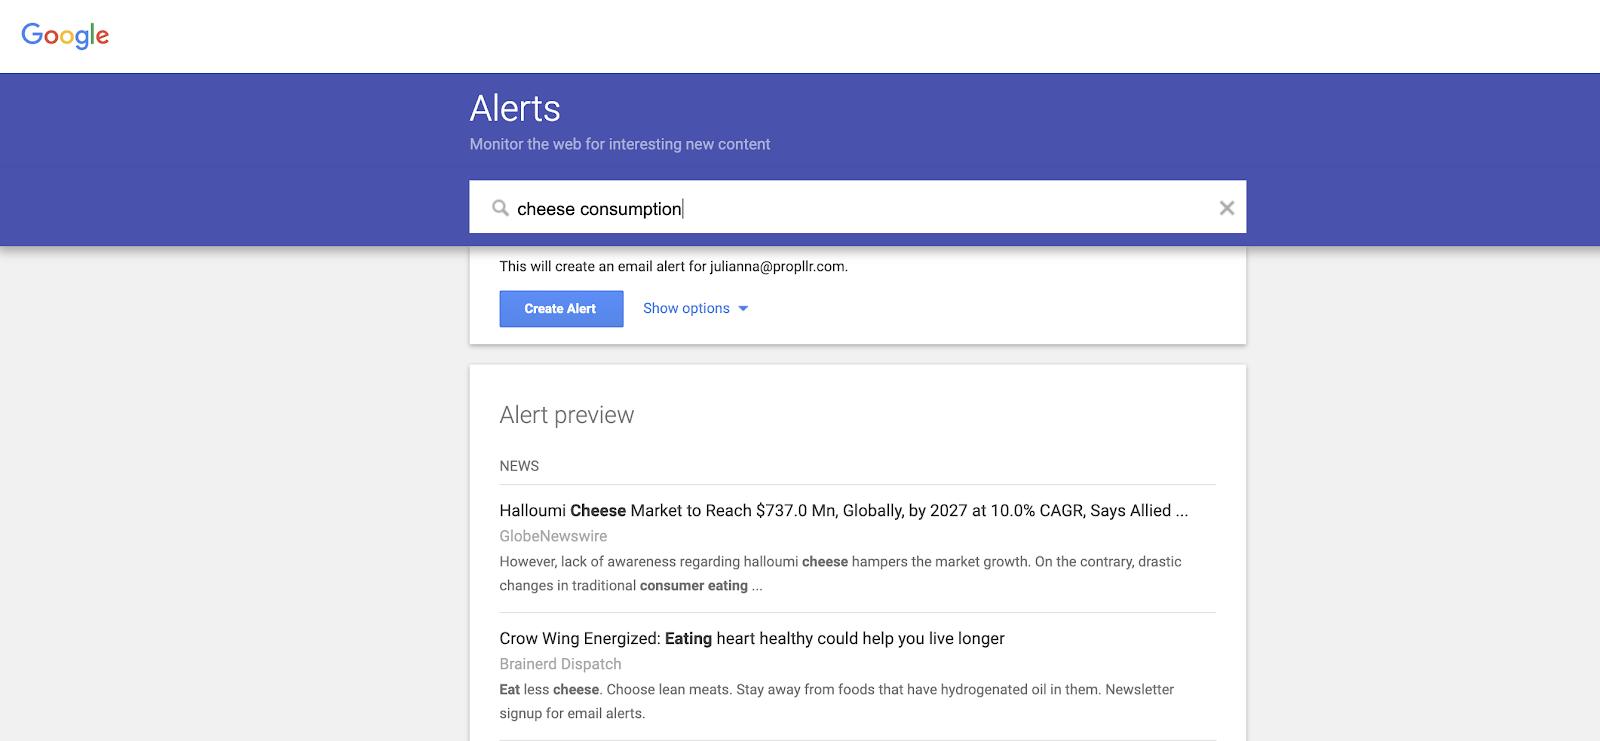 screenshot-google-alerts-cheese-consumption